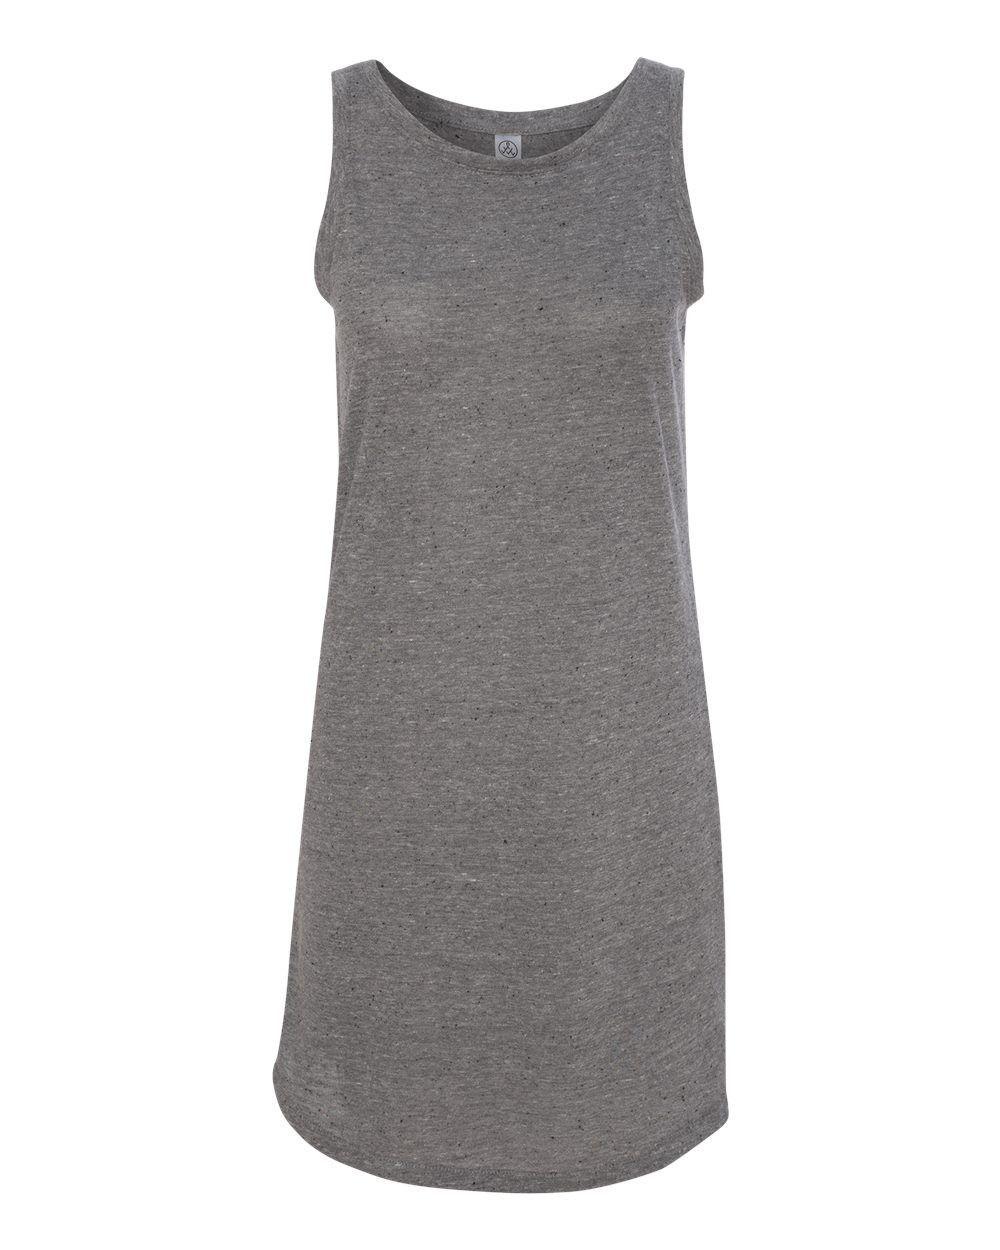 2828 Alternative - Women's Eco Nep Jersey Nautical Tank Dress